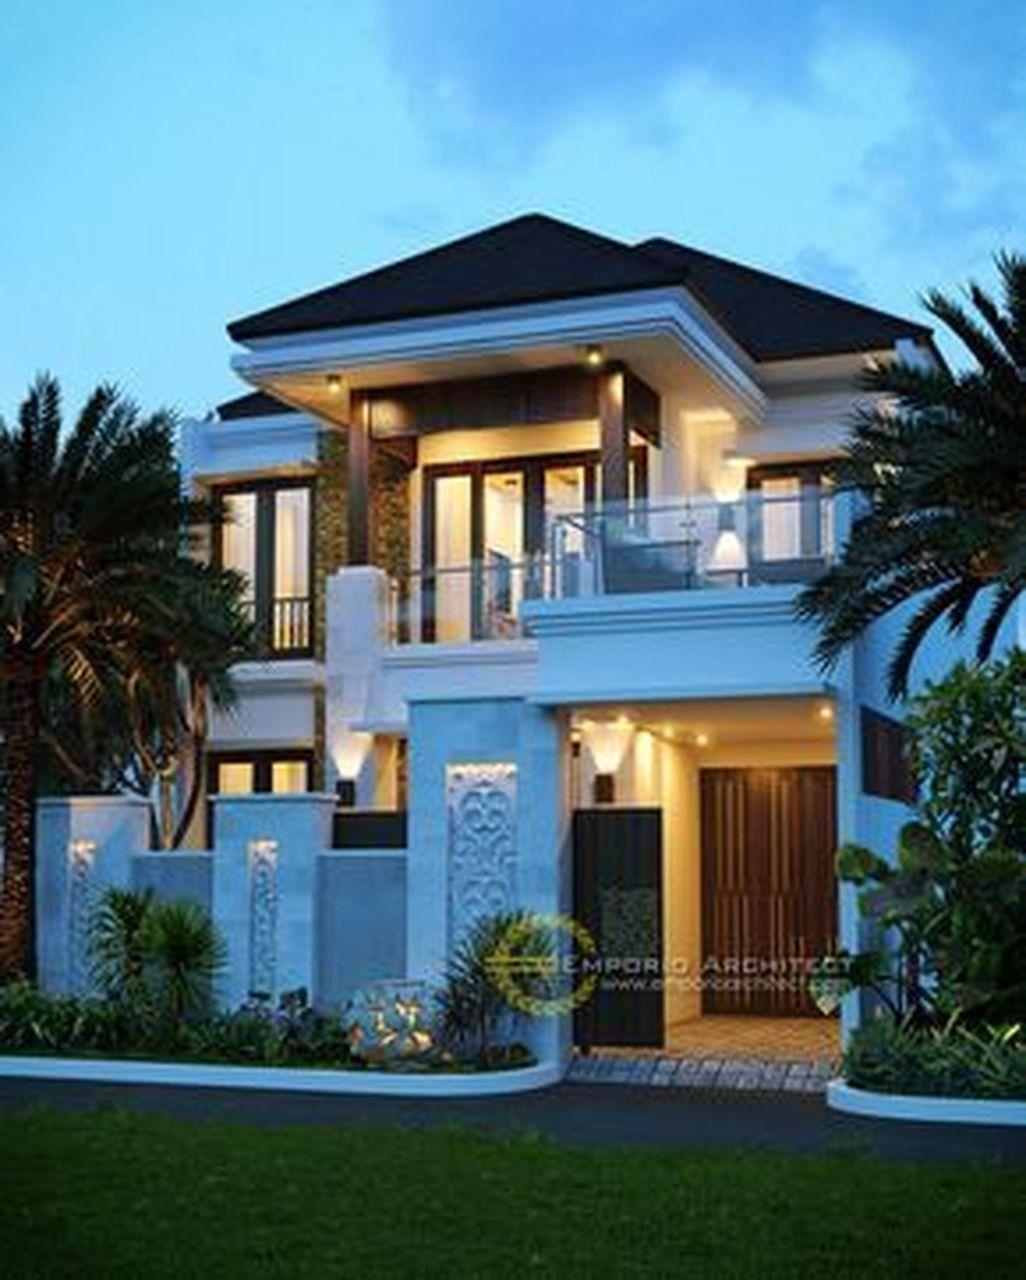 Elegant And Cozy Home Desain Ideas 34 House Designs Exterior Facade House Cozy House